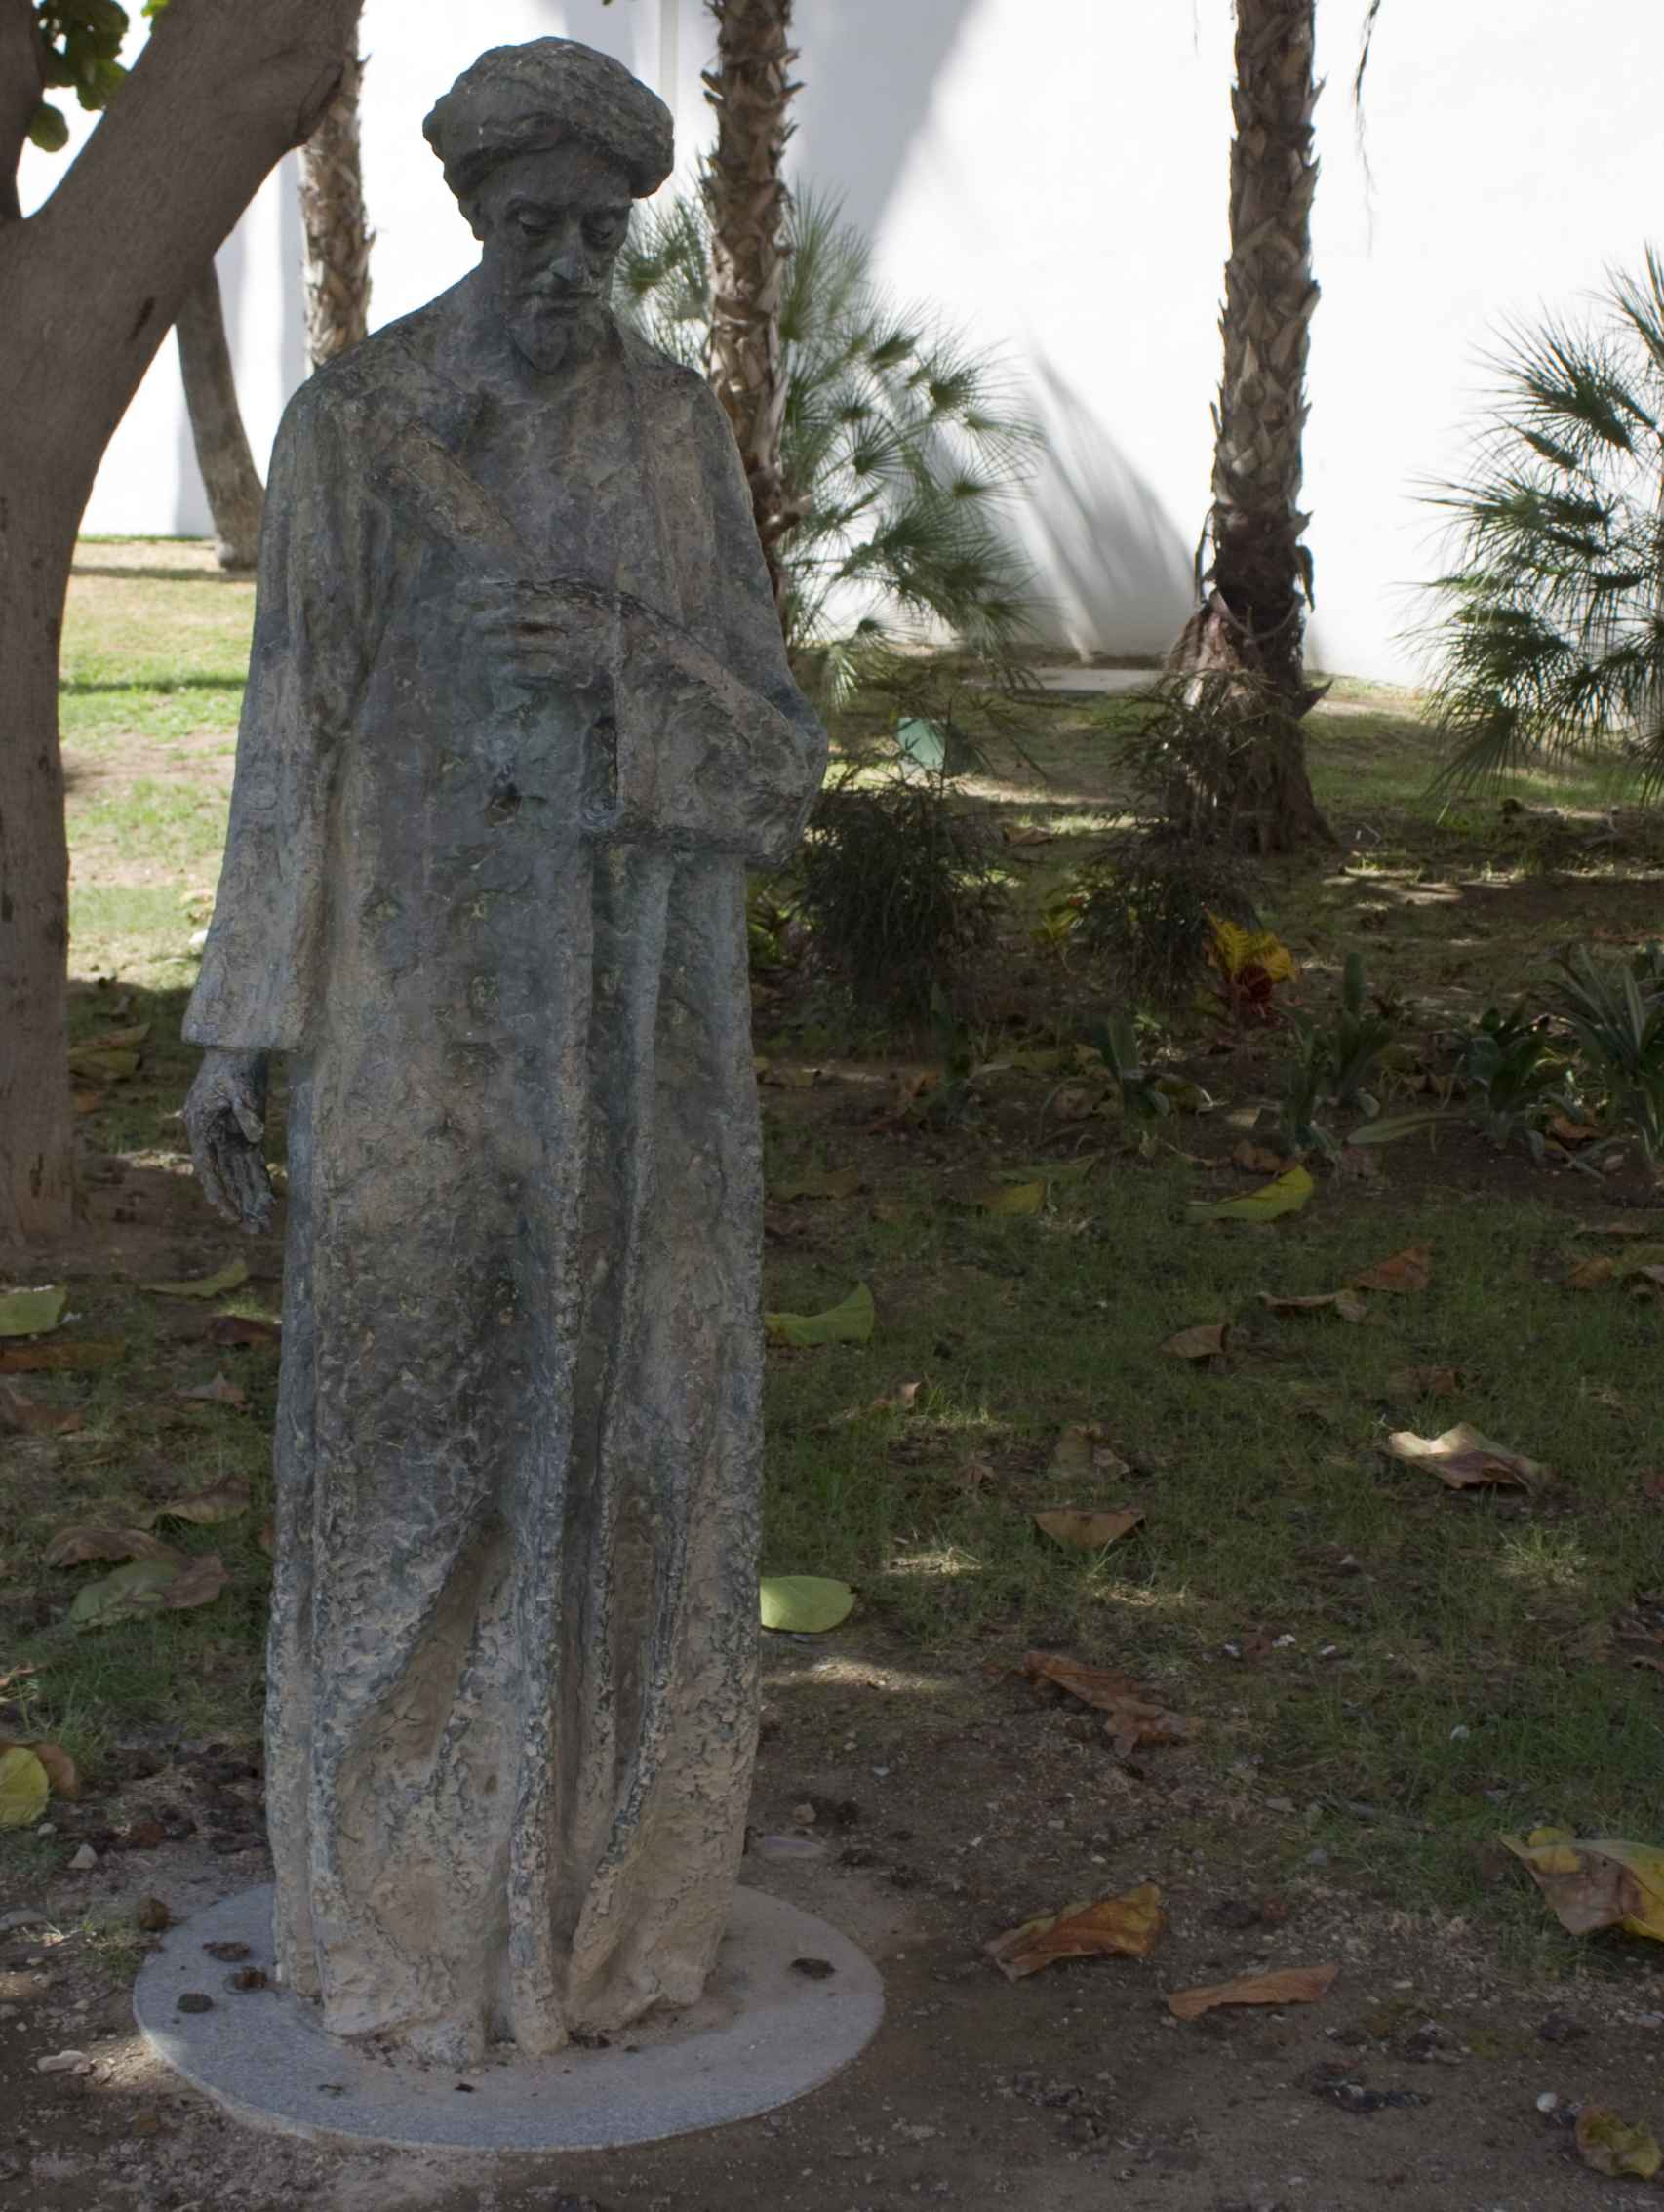 La estatua de Gabirol en la calle Alcazabilla.